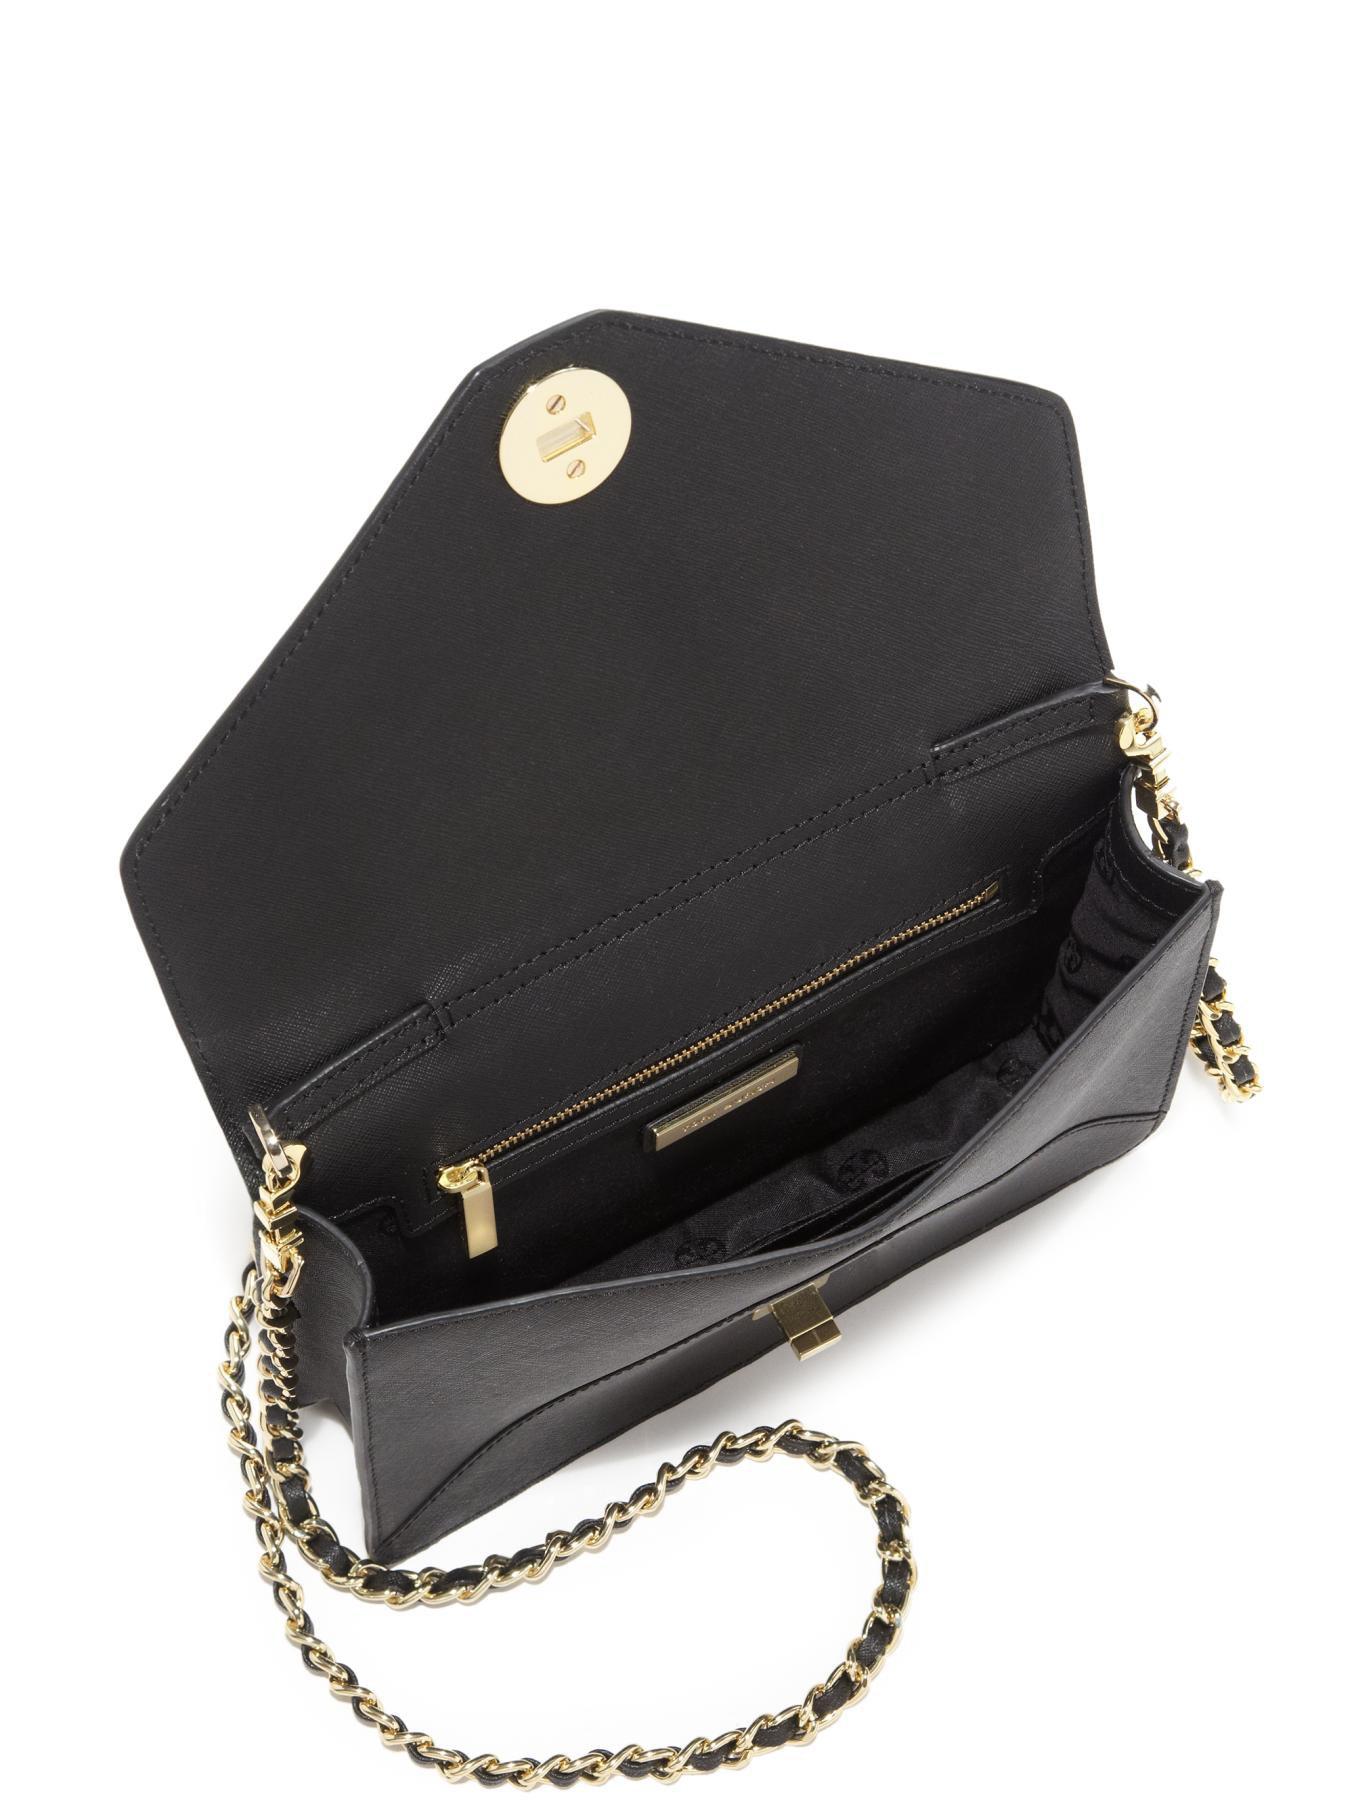 13b3ada3f2c Lyst - Tory Burch Kira Saffiano Envelope Shoulder Bag in Black